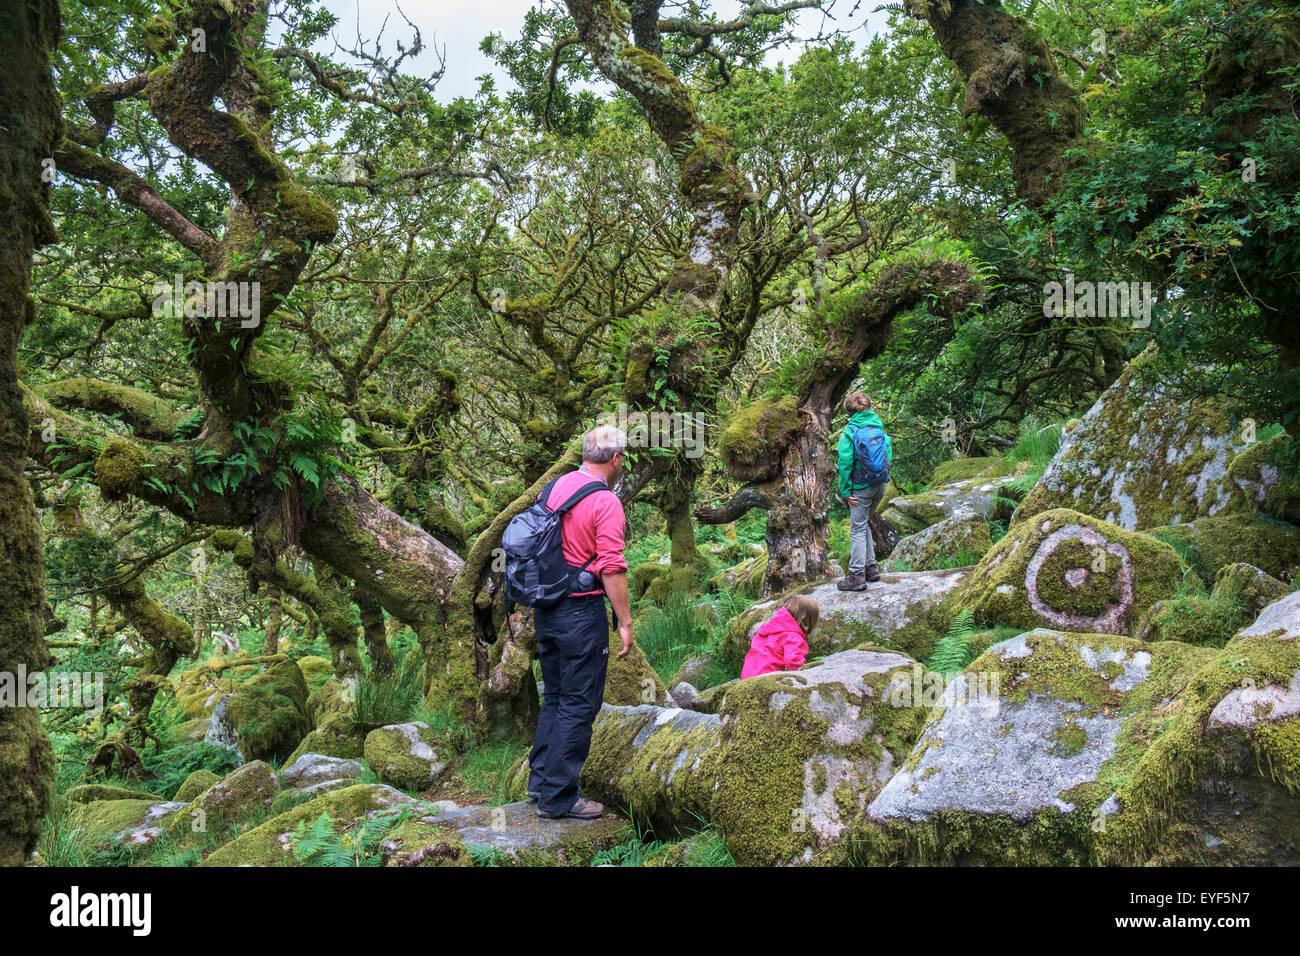 A family walking in Wistman's Wood, a high-altitude oakwood (Quercus robur), near Two Bridges, Dartmoor, Devon, - Stock Image